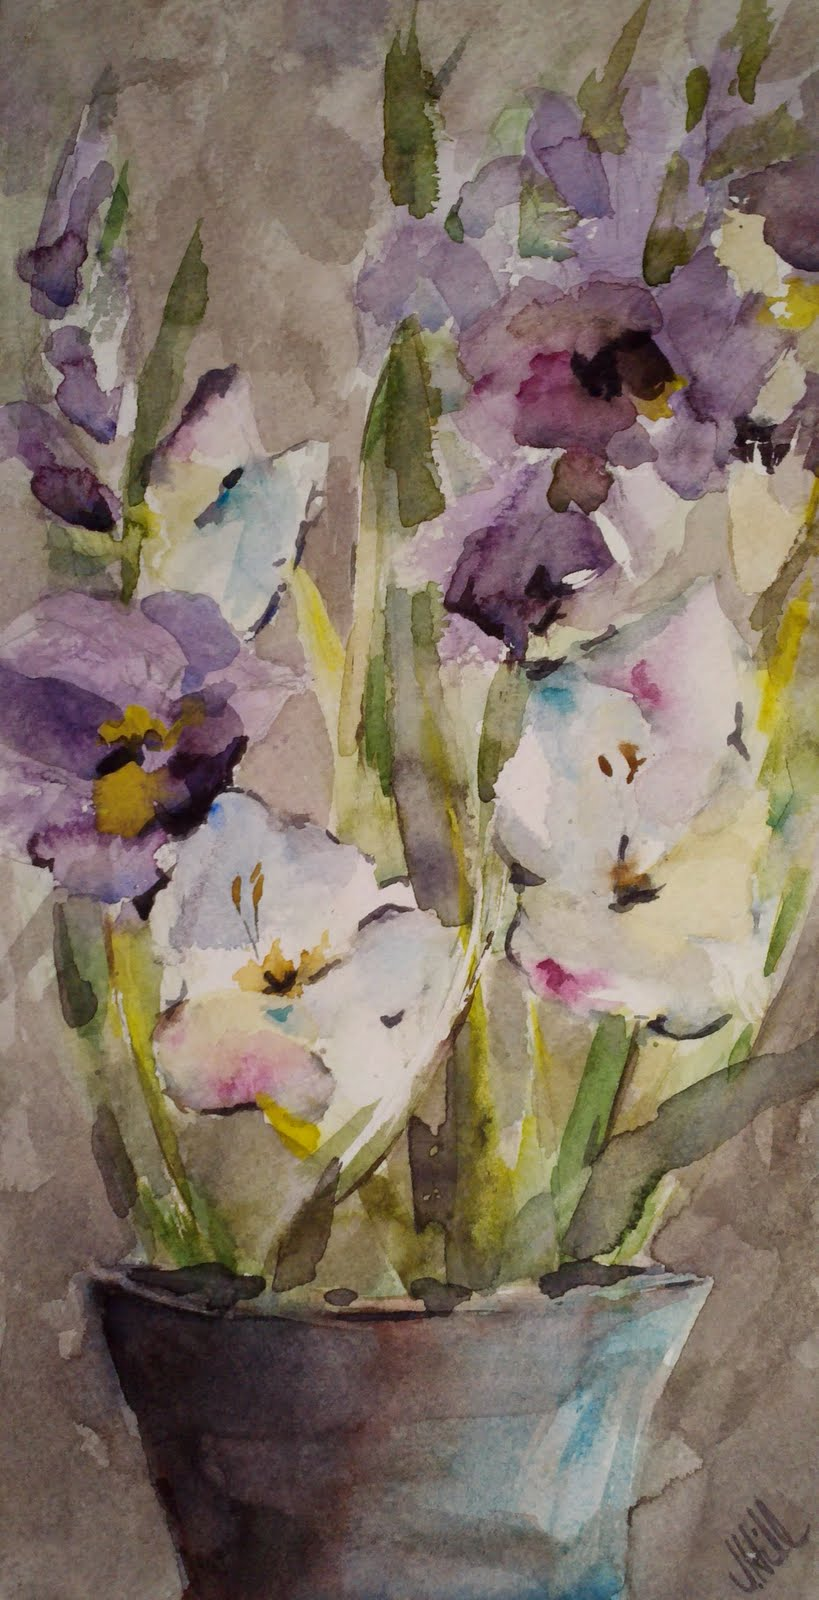 An Afternoon with a Friend original fine art by Julie Hill